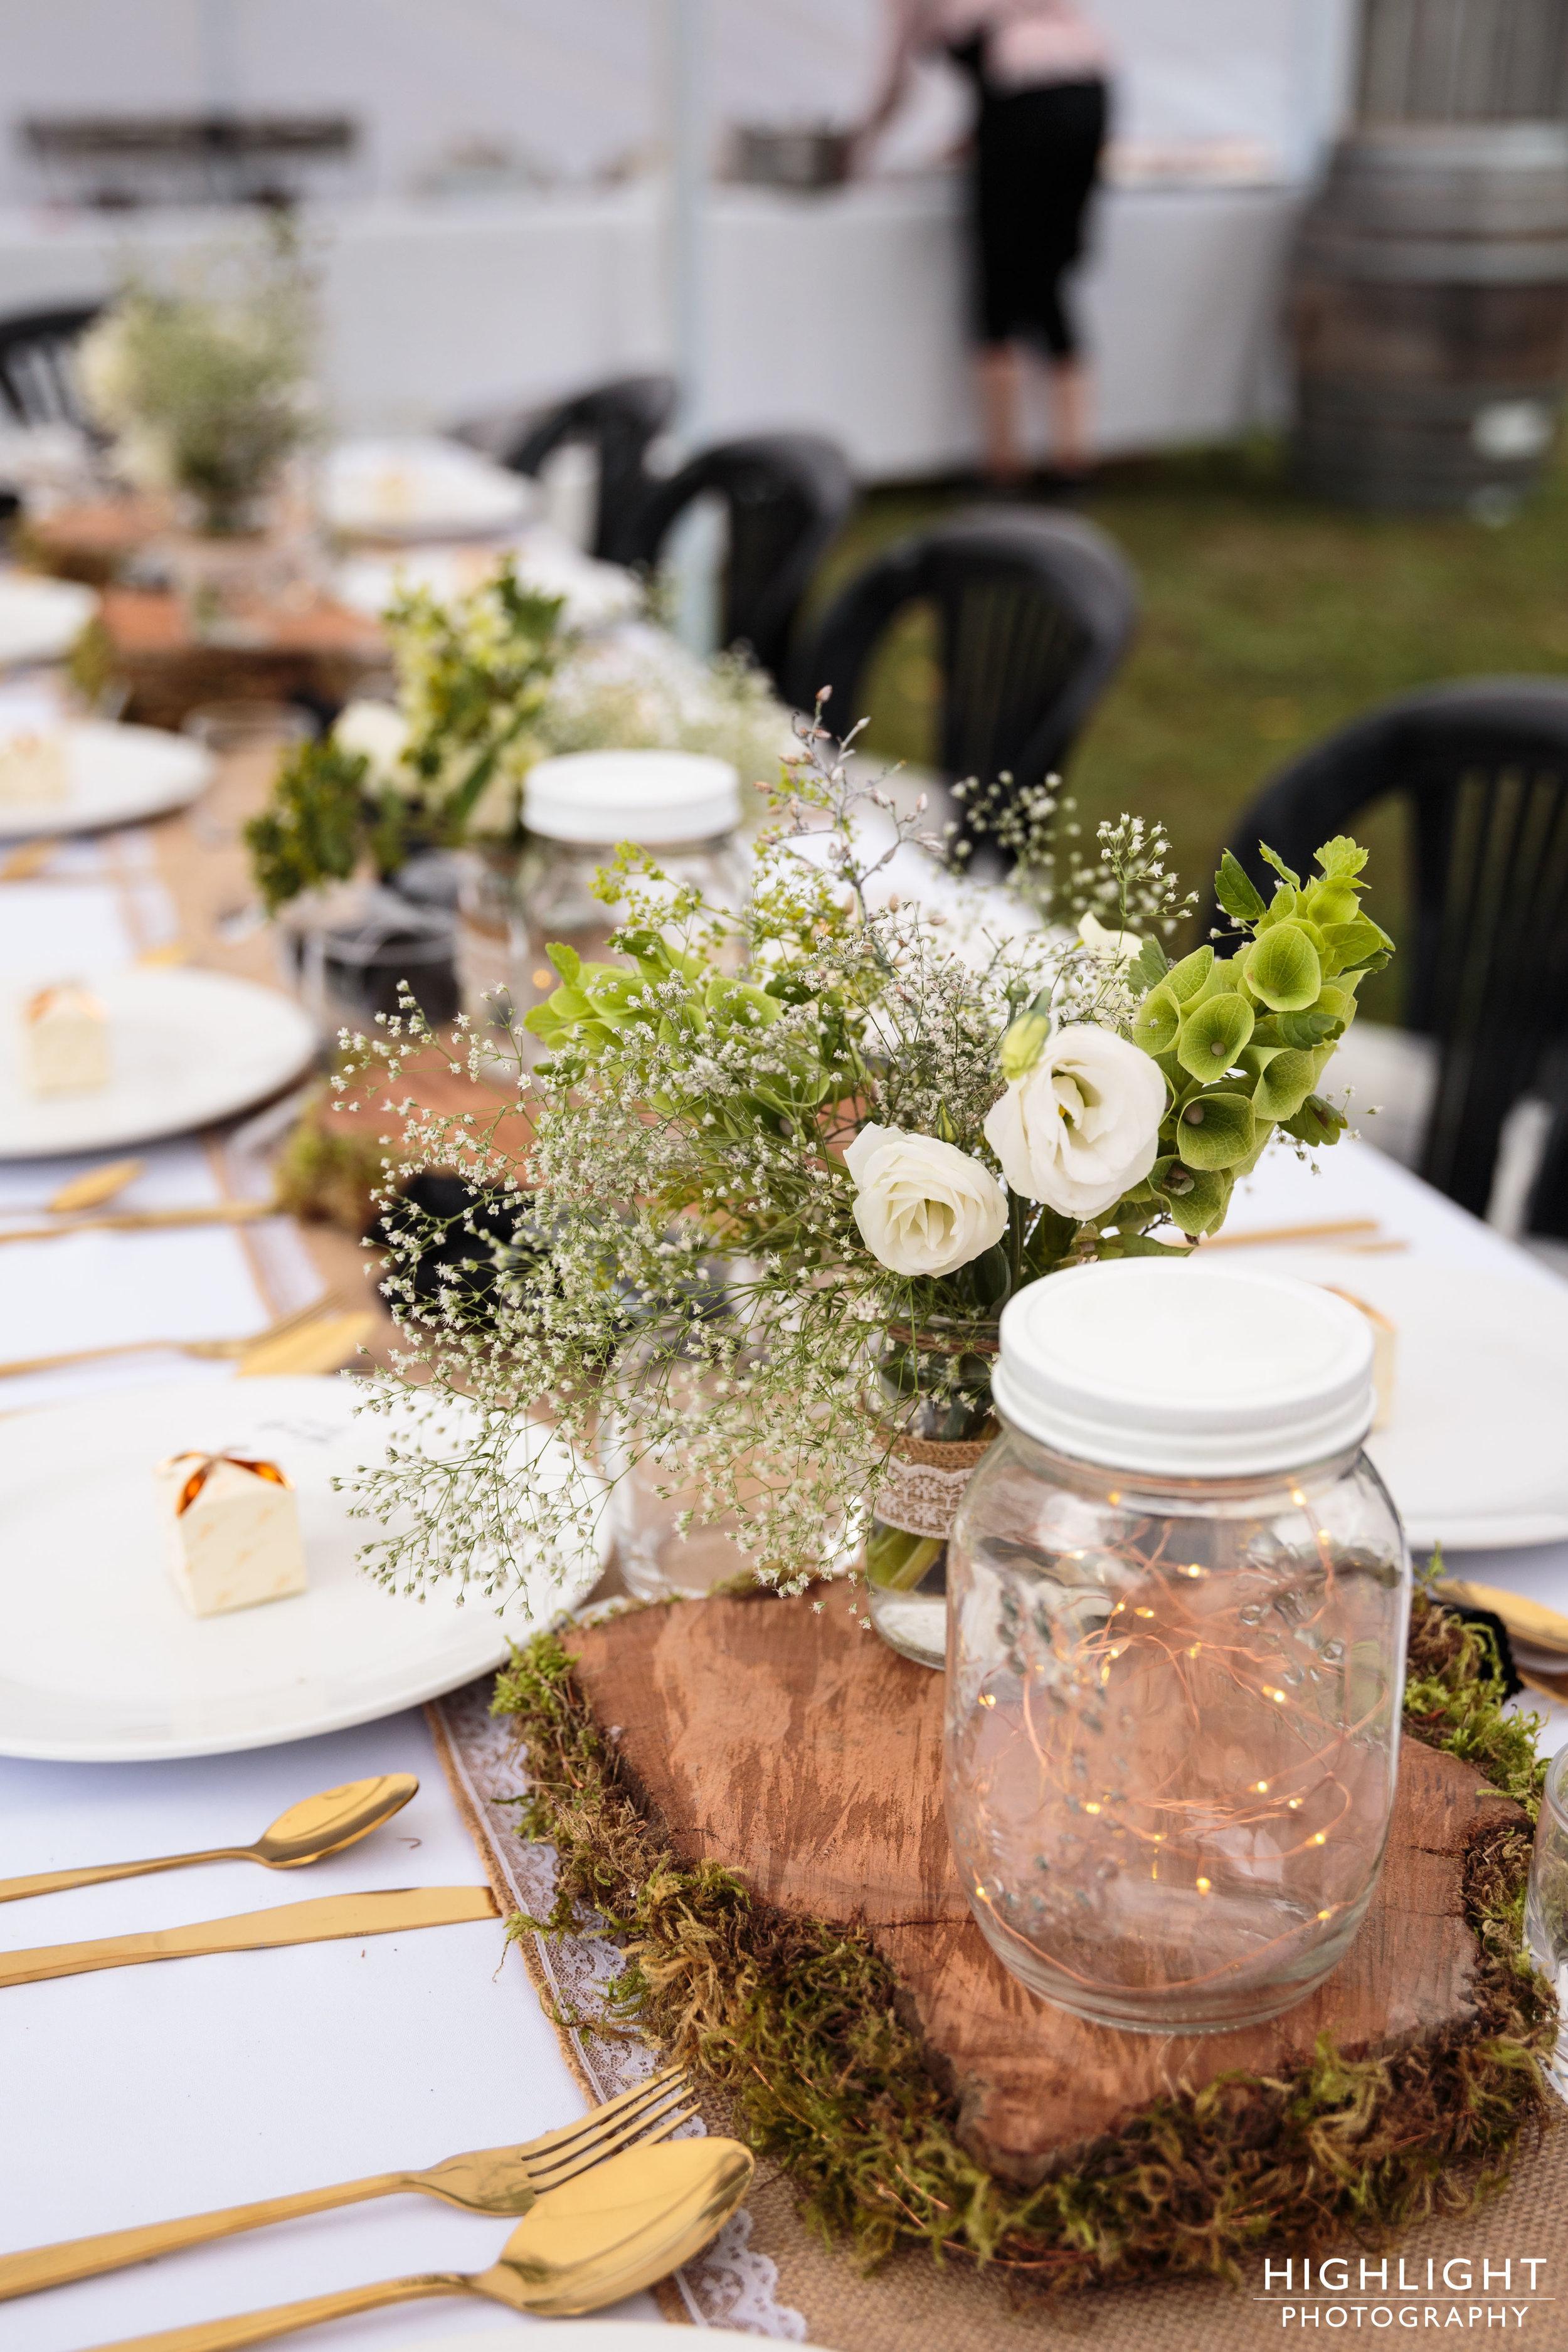 JM-2017-Highlight-wedding-photography-palmerston-north-new-zealand-152.jpg